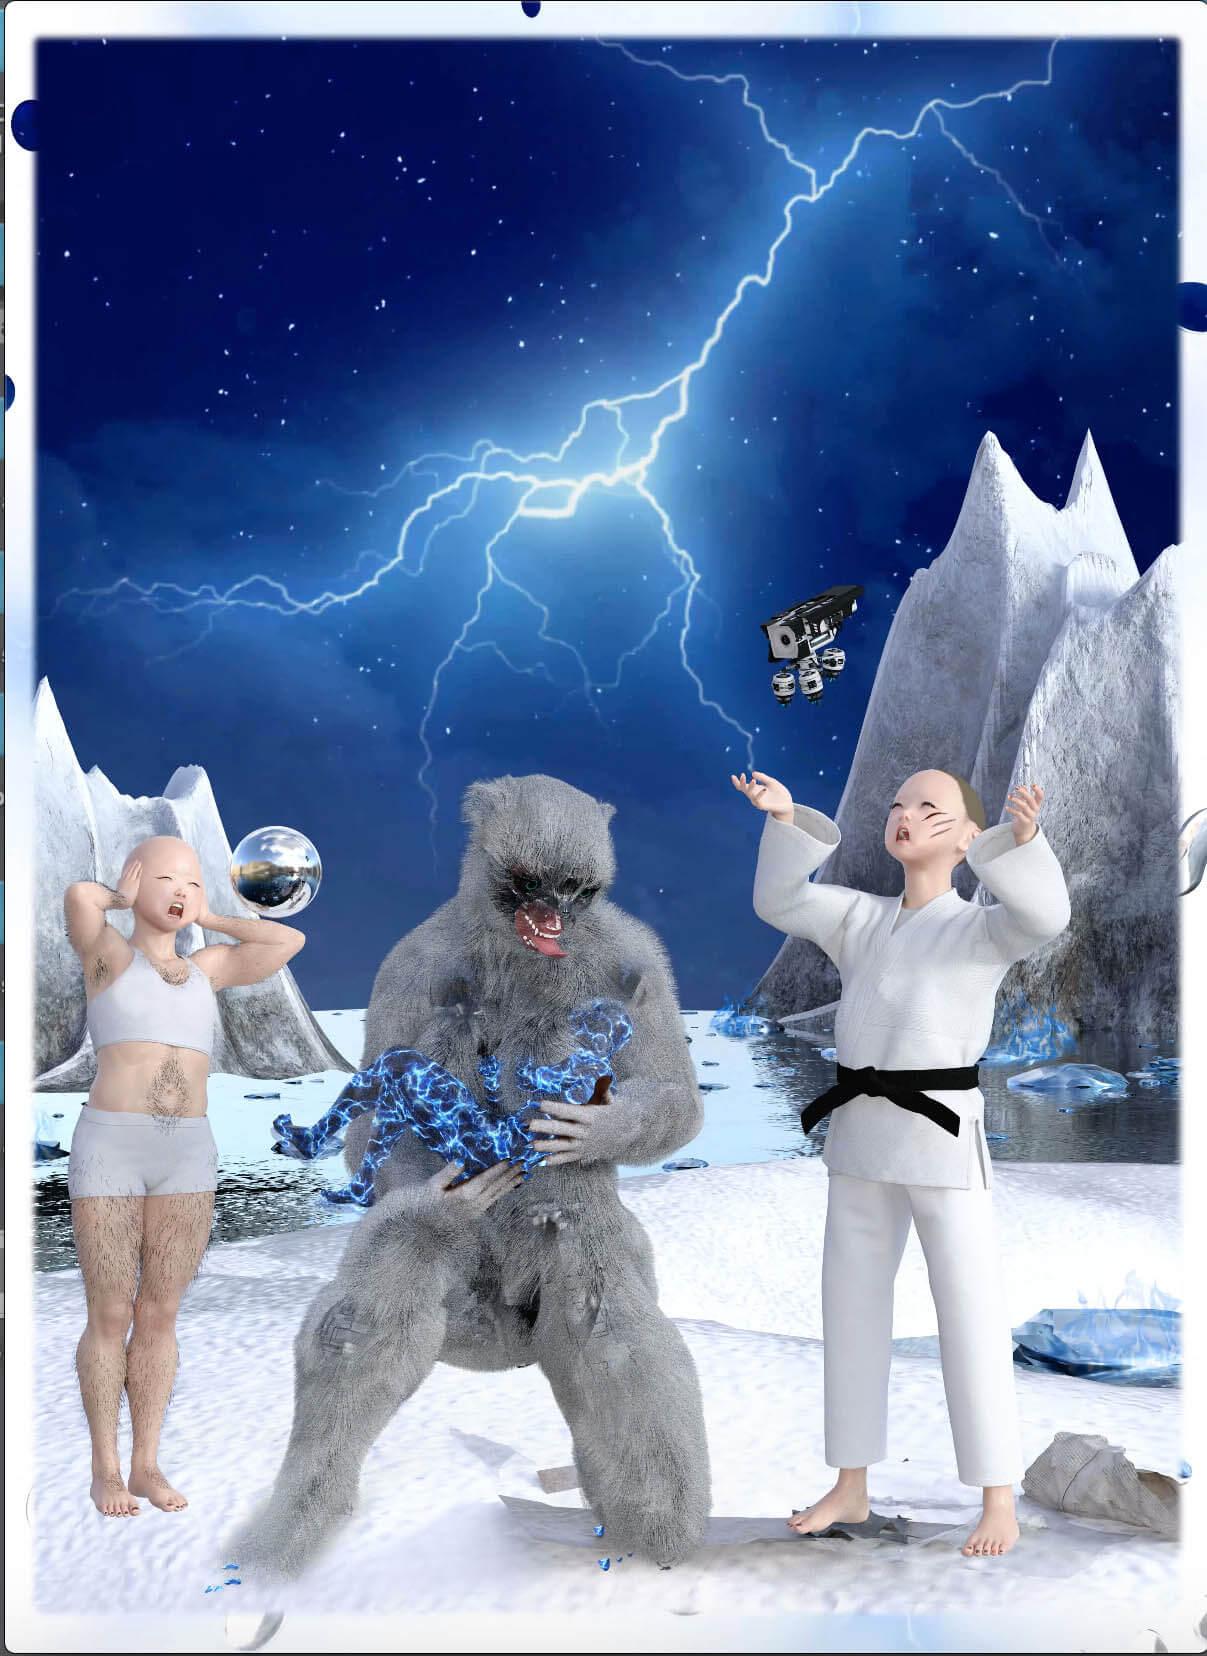 Wednesday Kim Cryptic Nostalgia and the Digital Undertakers (2021)